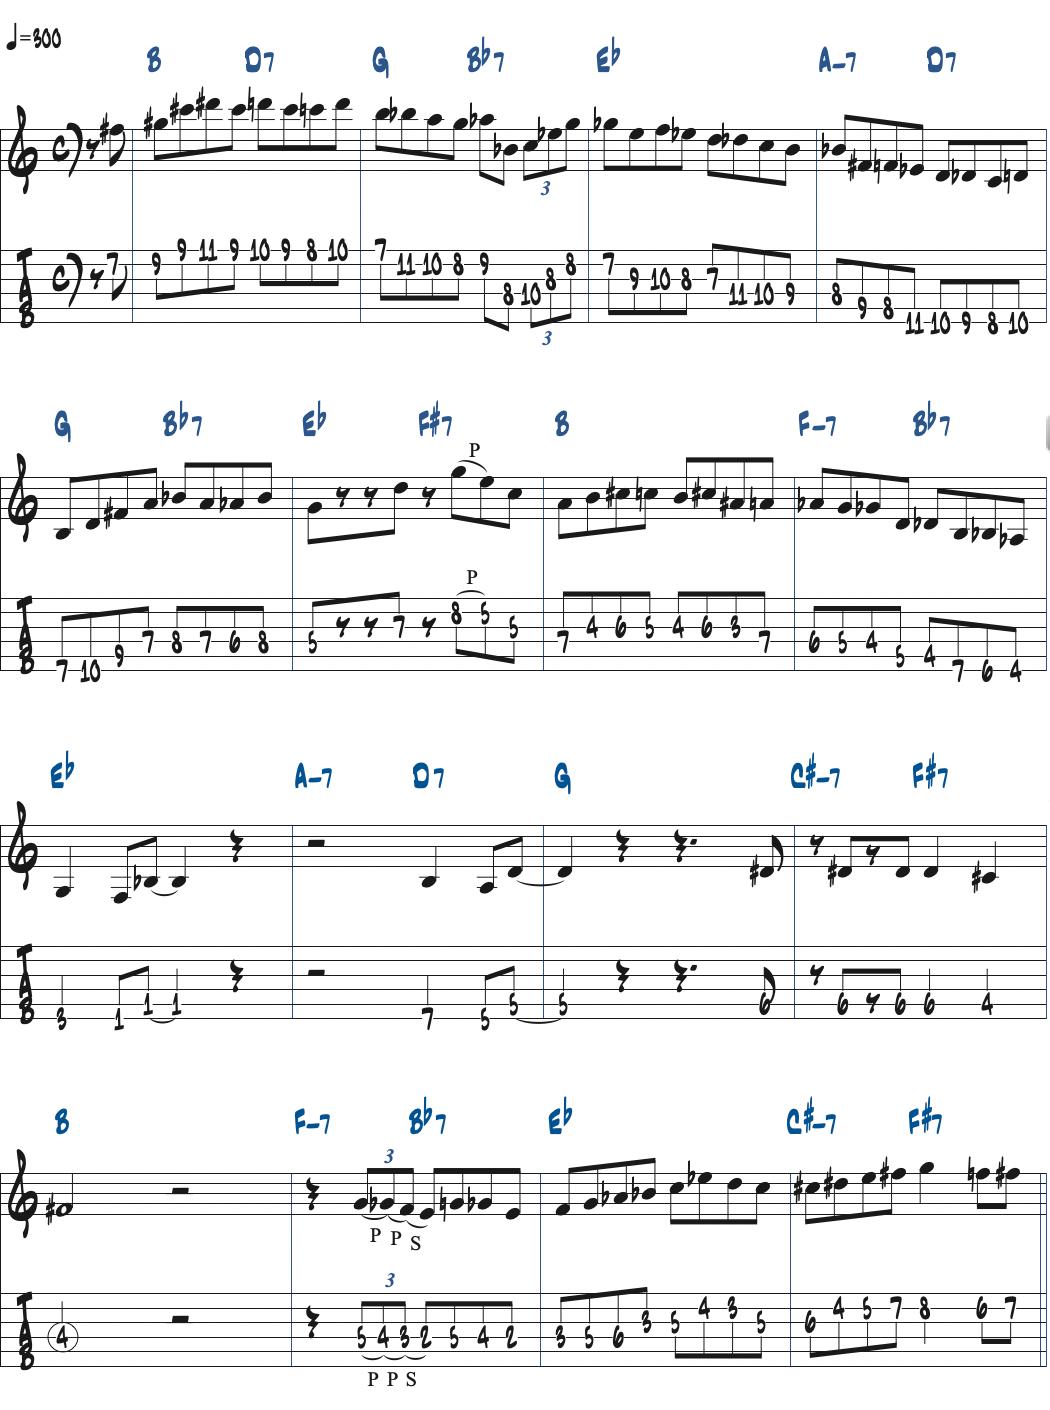 Cecil Alexanderが弾くGiant Stepsタブ譜つきギタースコア楽譜ページ1